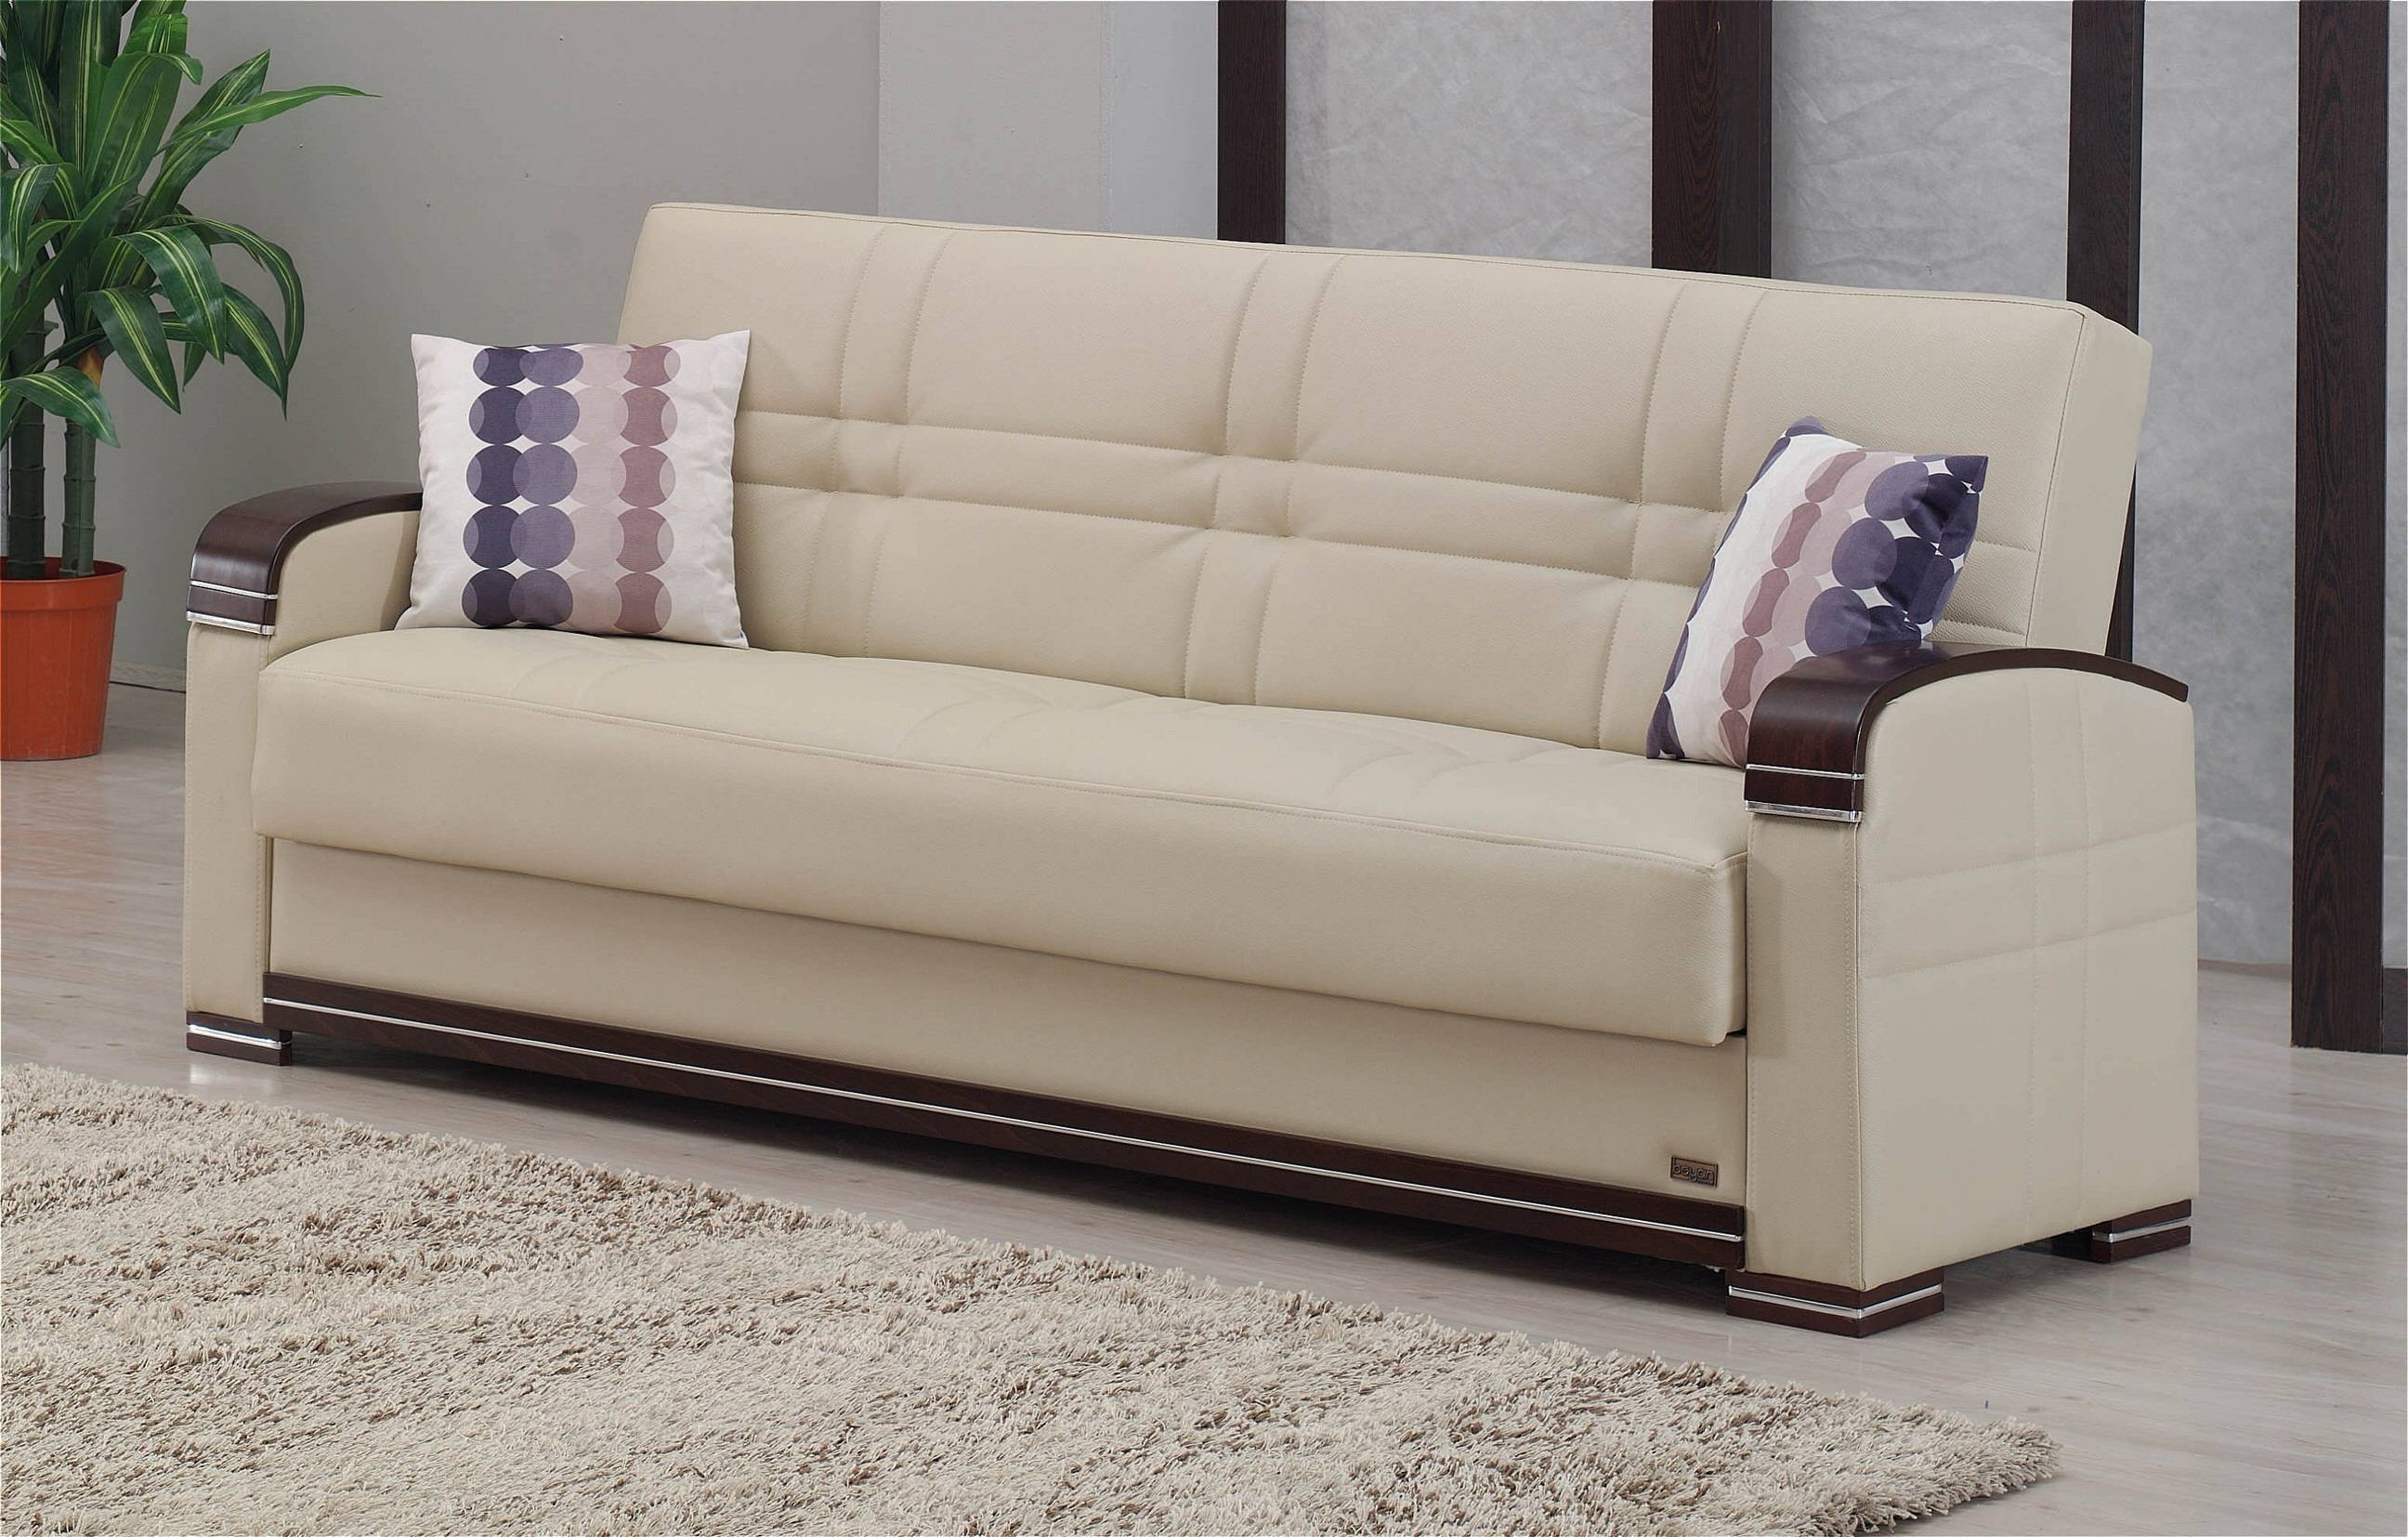 Fulton Cream Leather Sofa Bedempire Furniture Usa in Fulton Sofa Beds (Image 13 of 30)